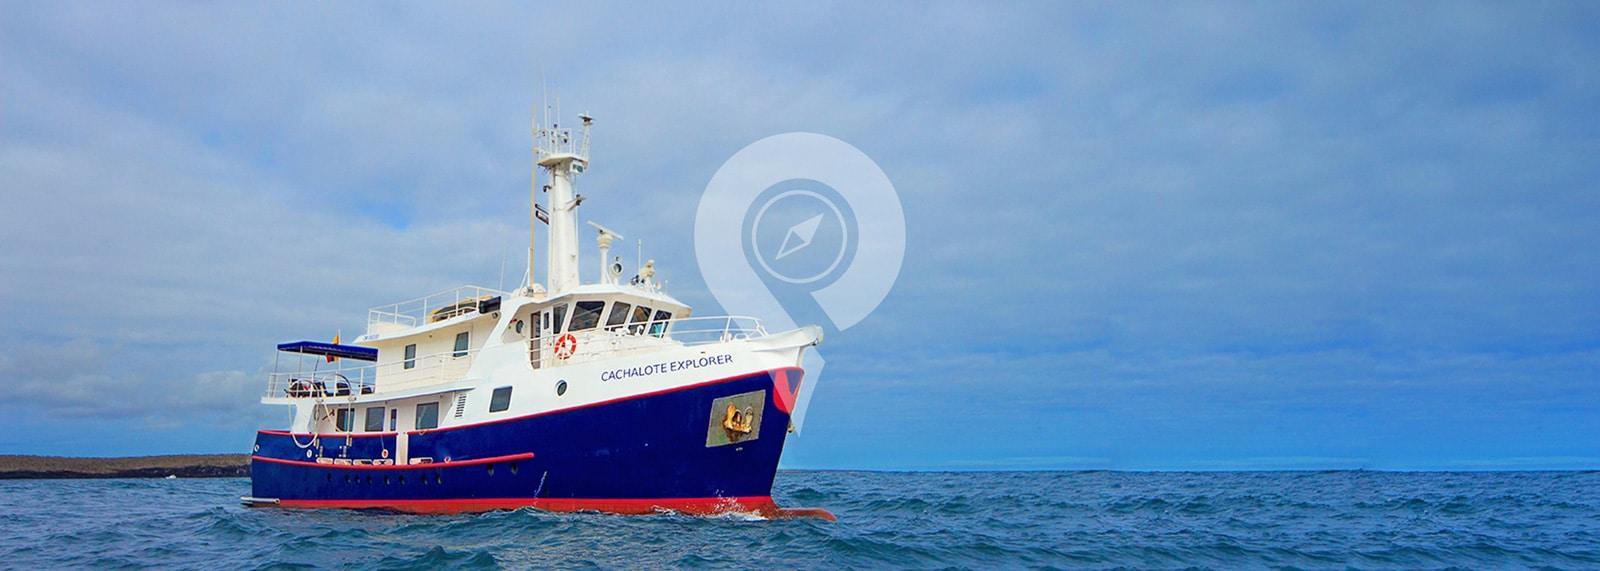 Cachalote Explorer Galapagos Yacht